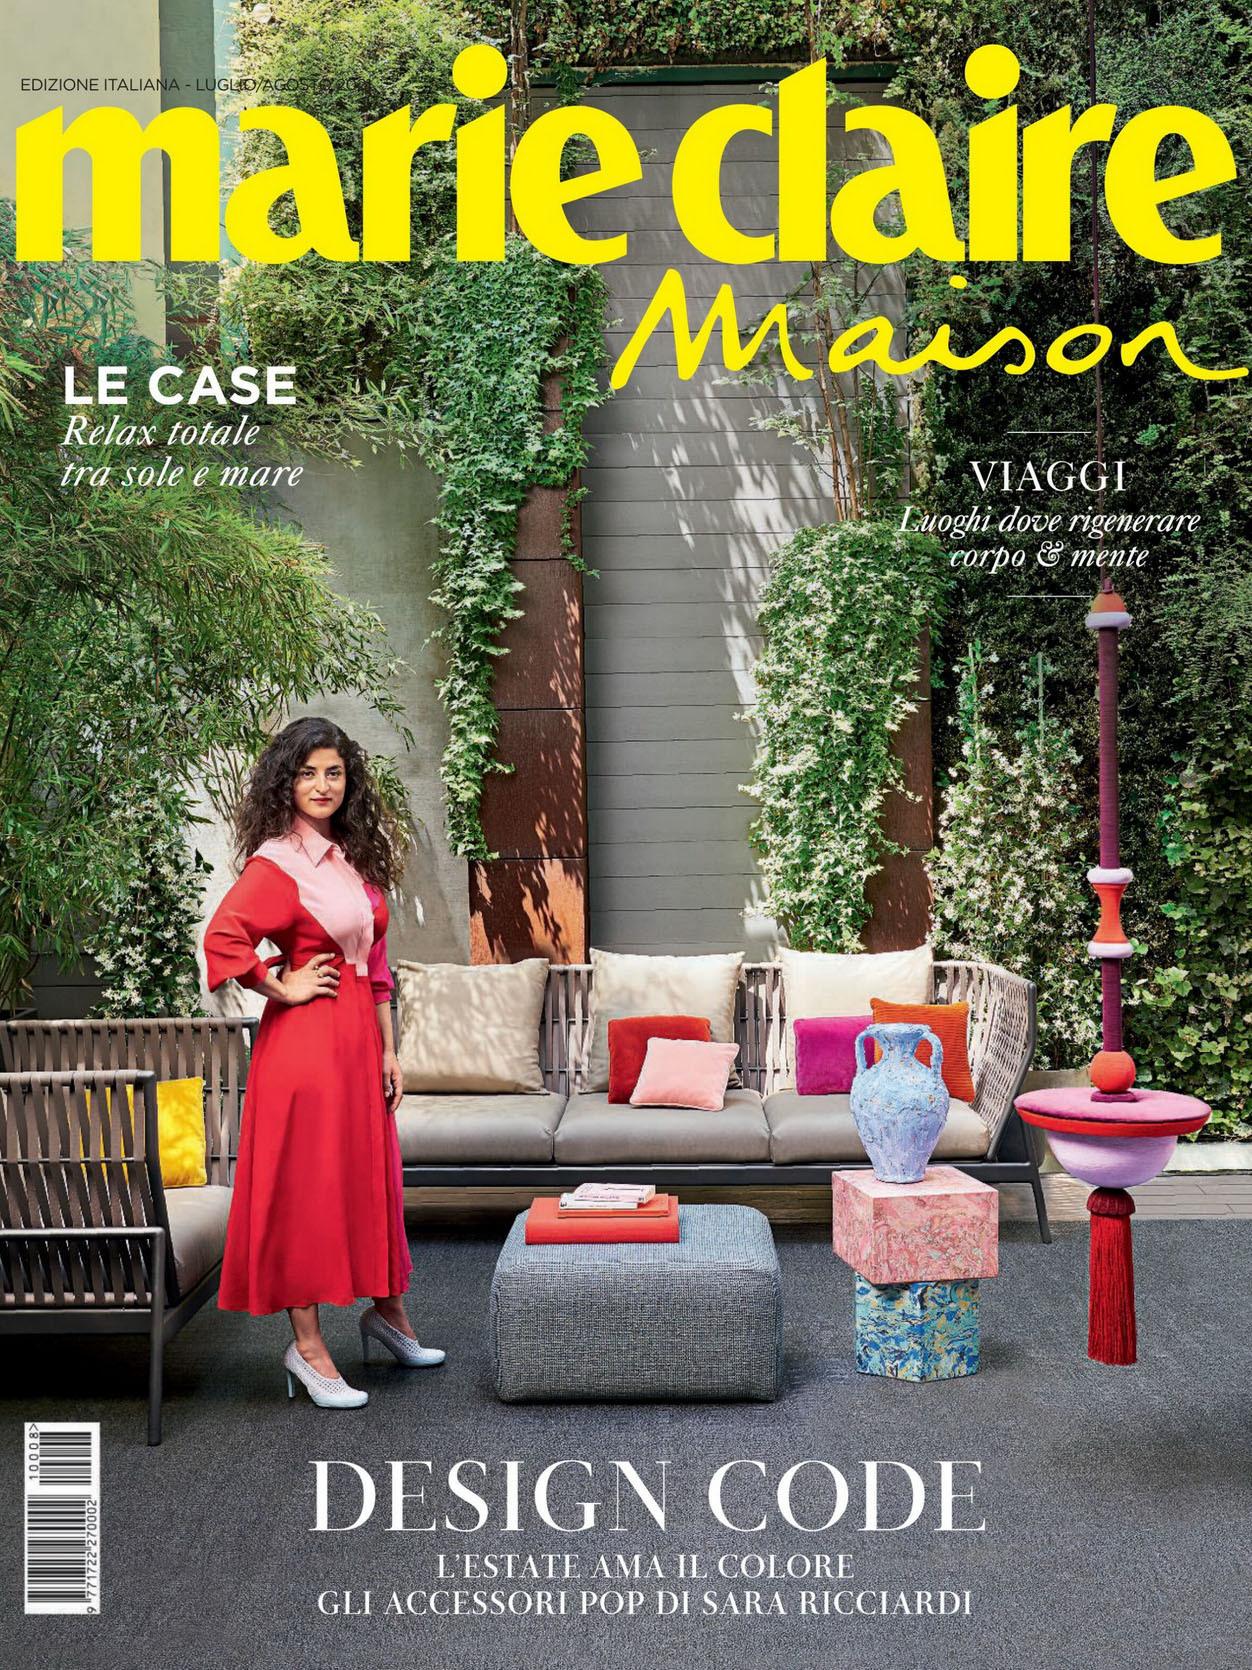 《Marie Claire maison》意大利版时尚室内设计杂志2021年07-08月号